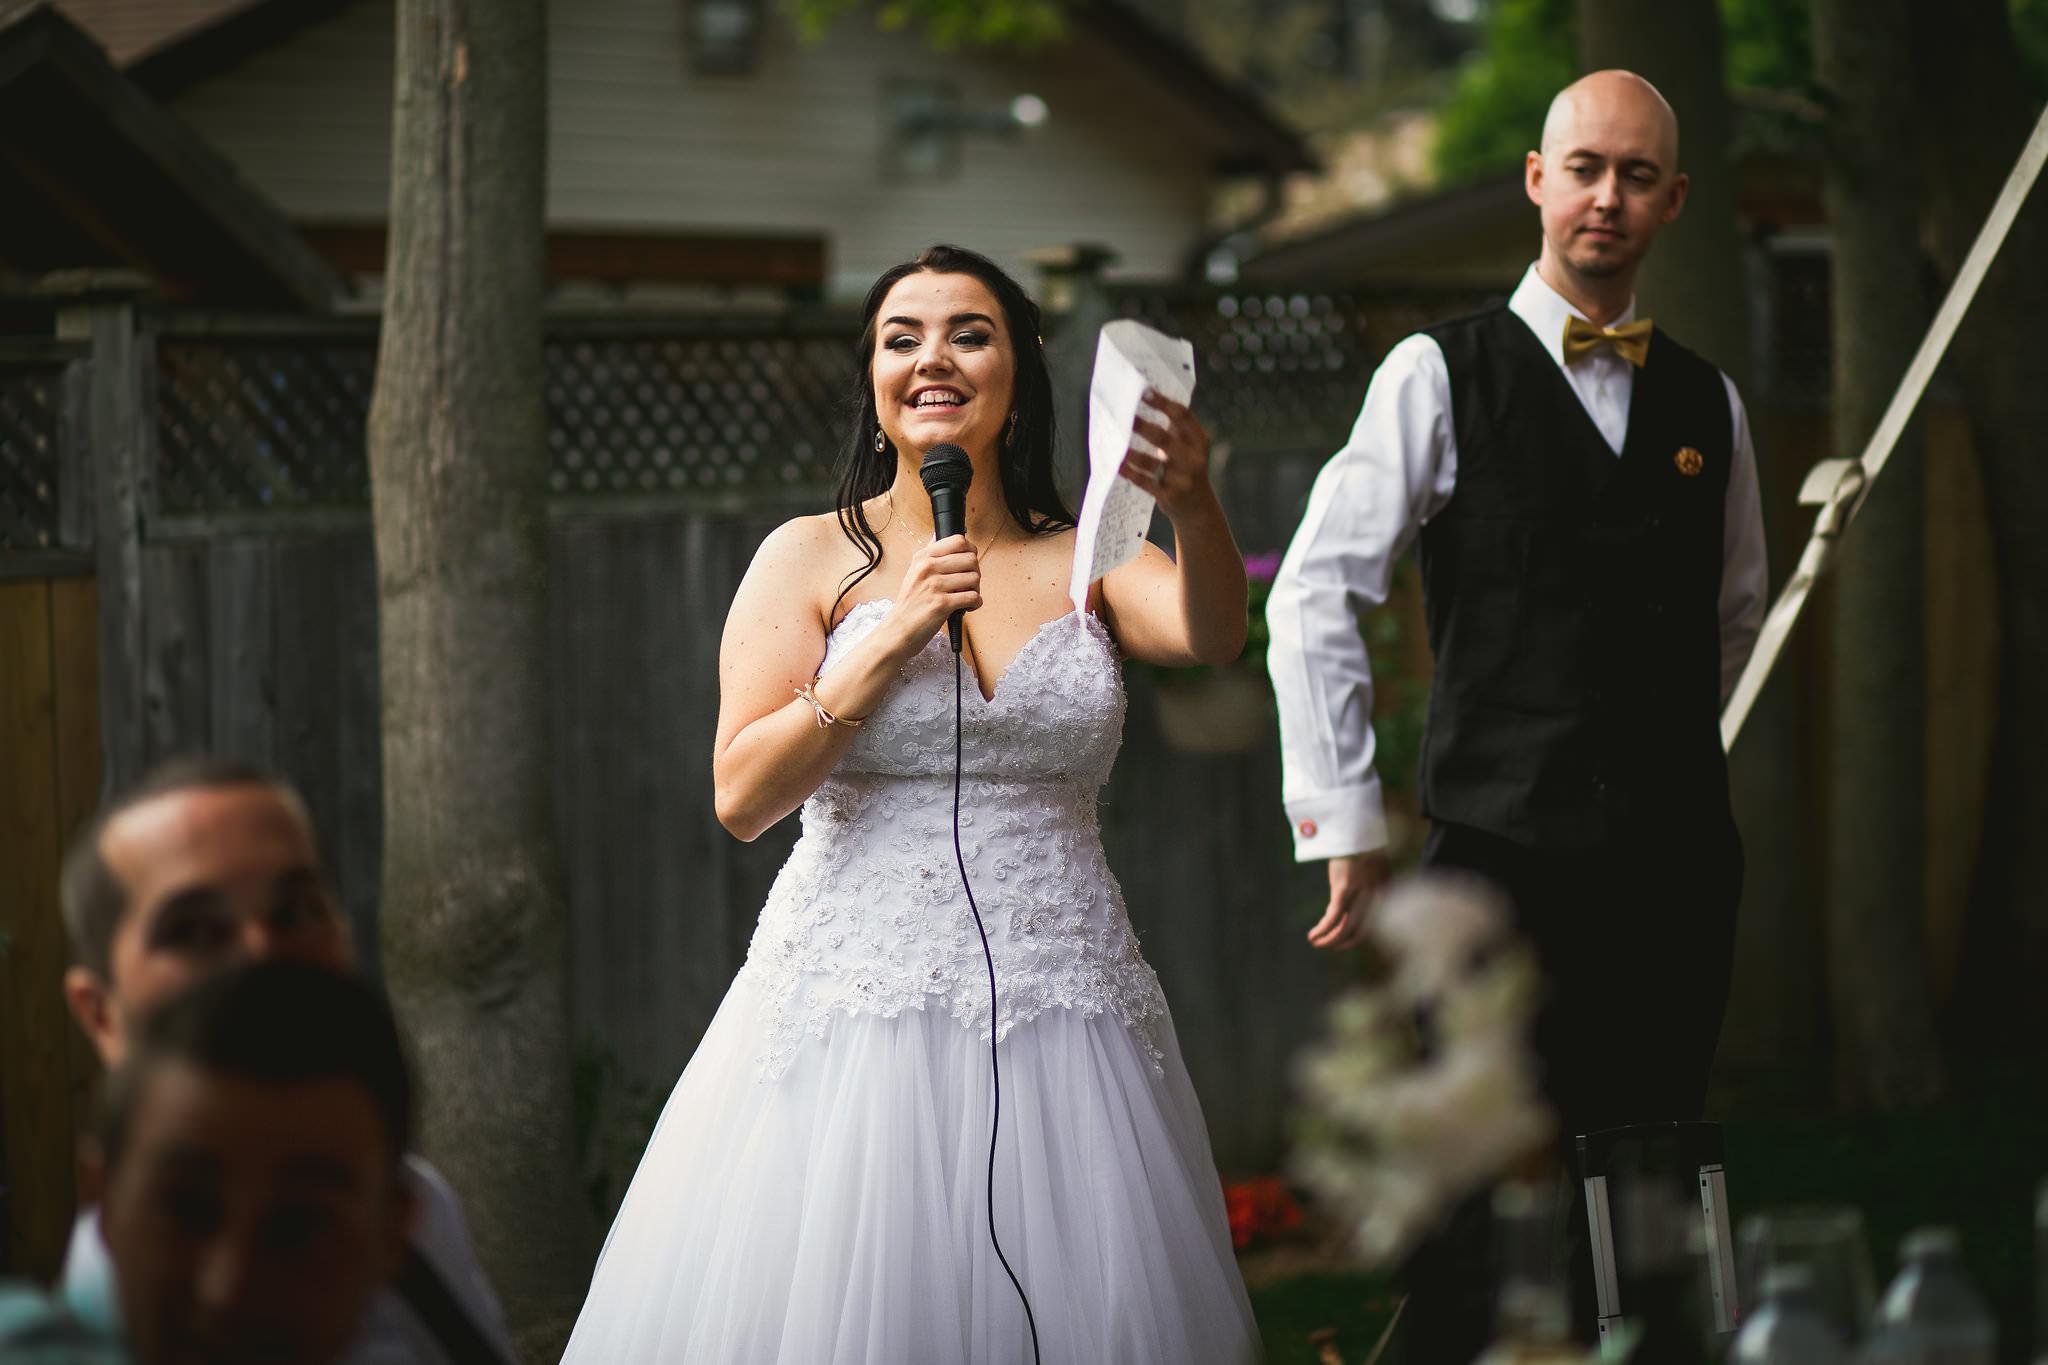 Kristen Adam Kindred Loft Whitby Wedding Photos 526 - Durham Wedding Photographer: Kindred Loft Wedding Photos